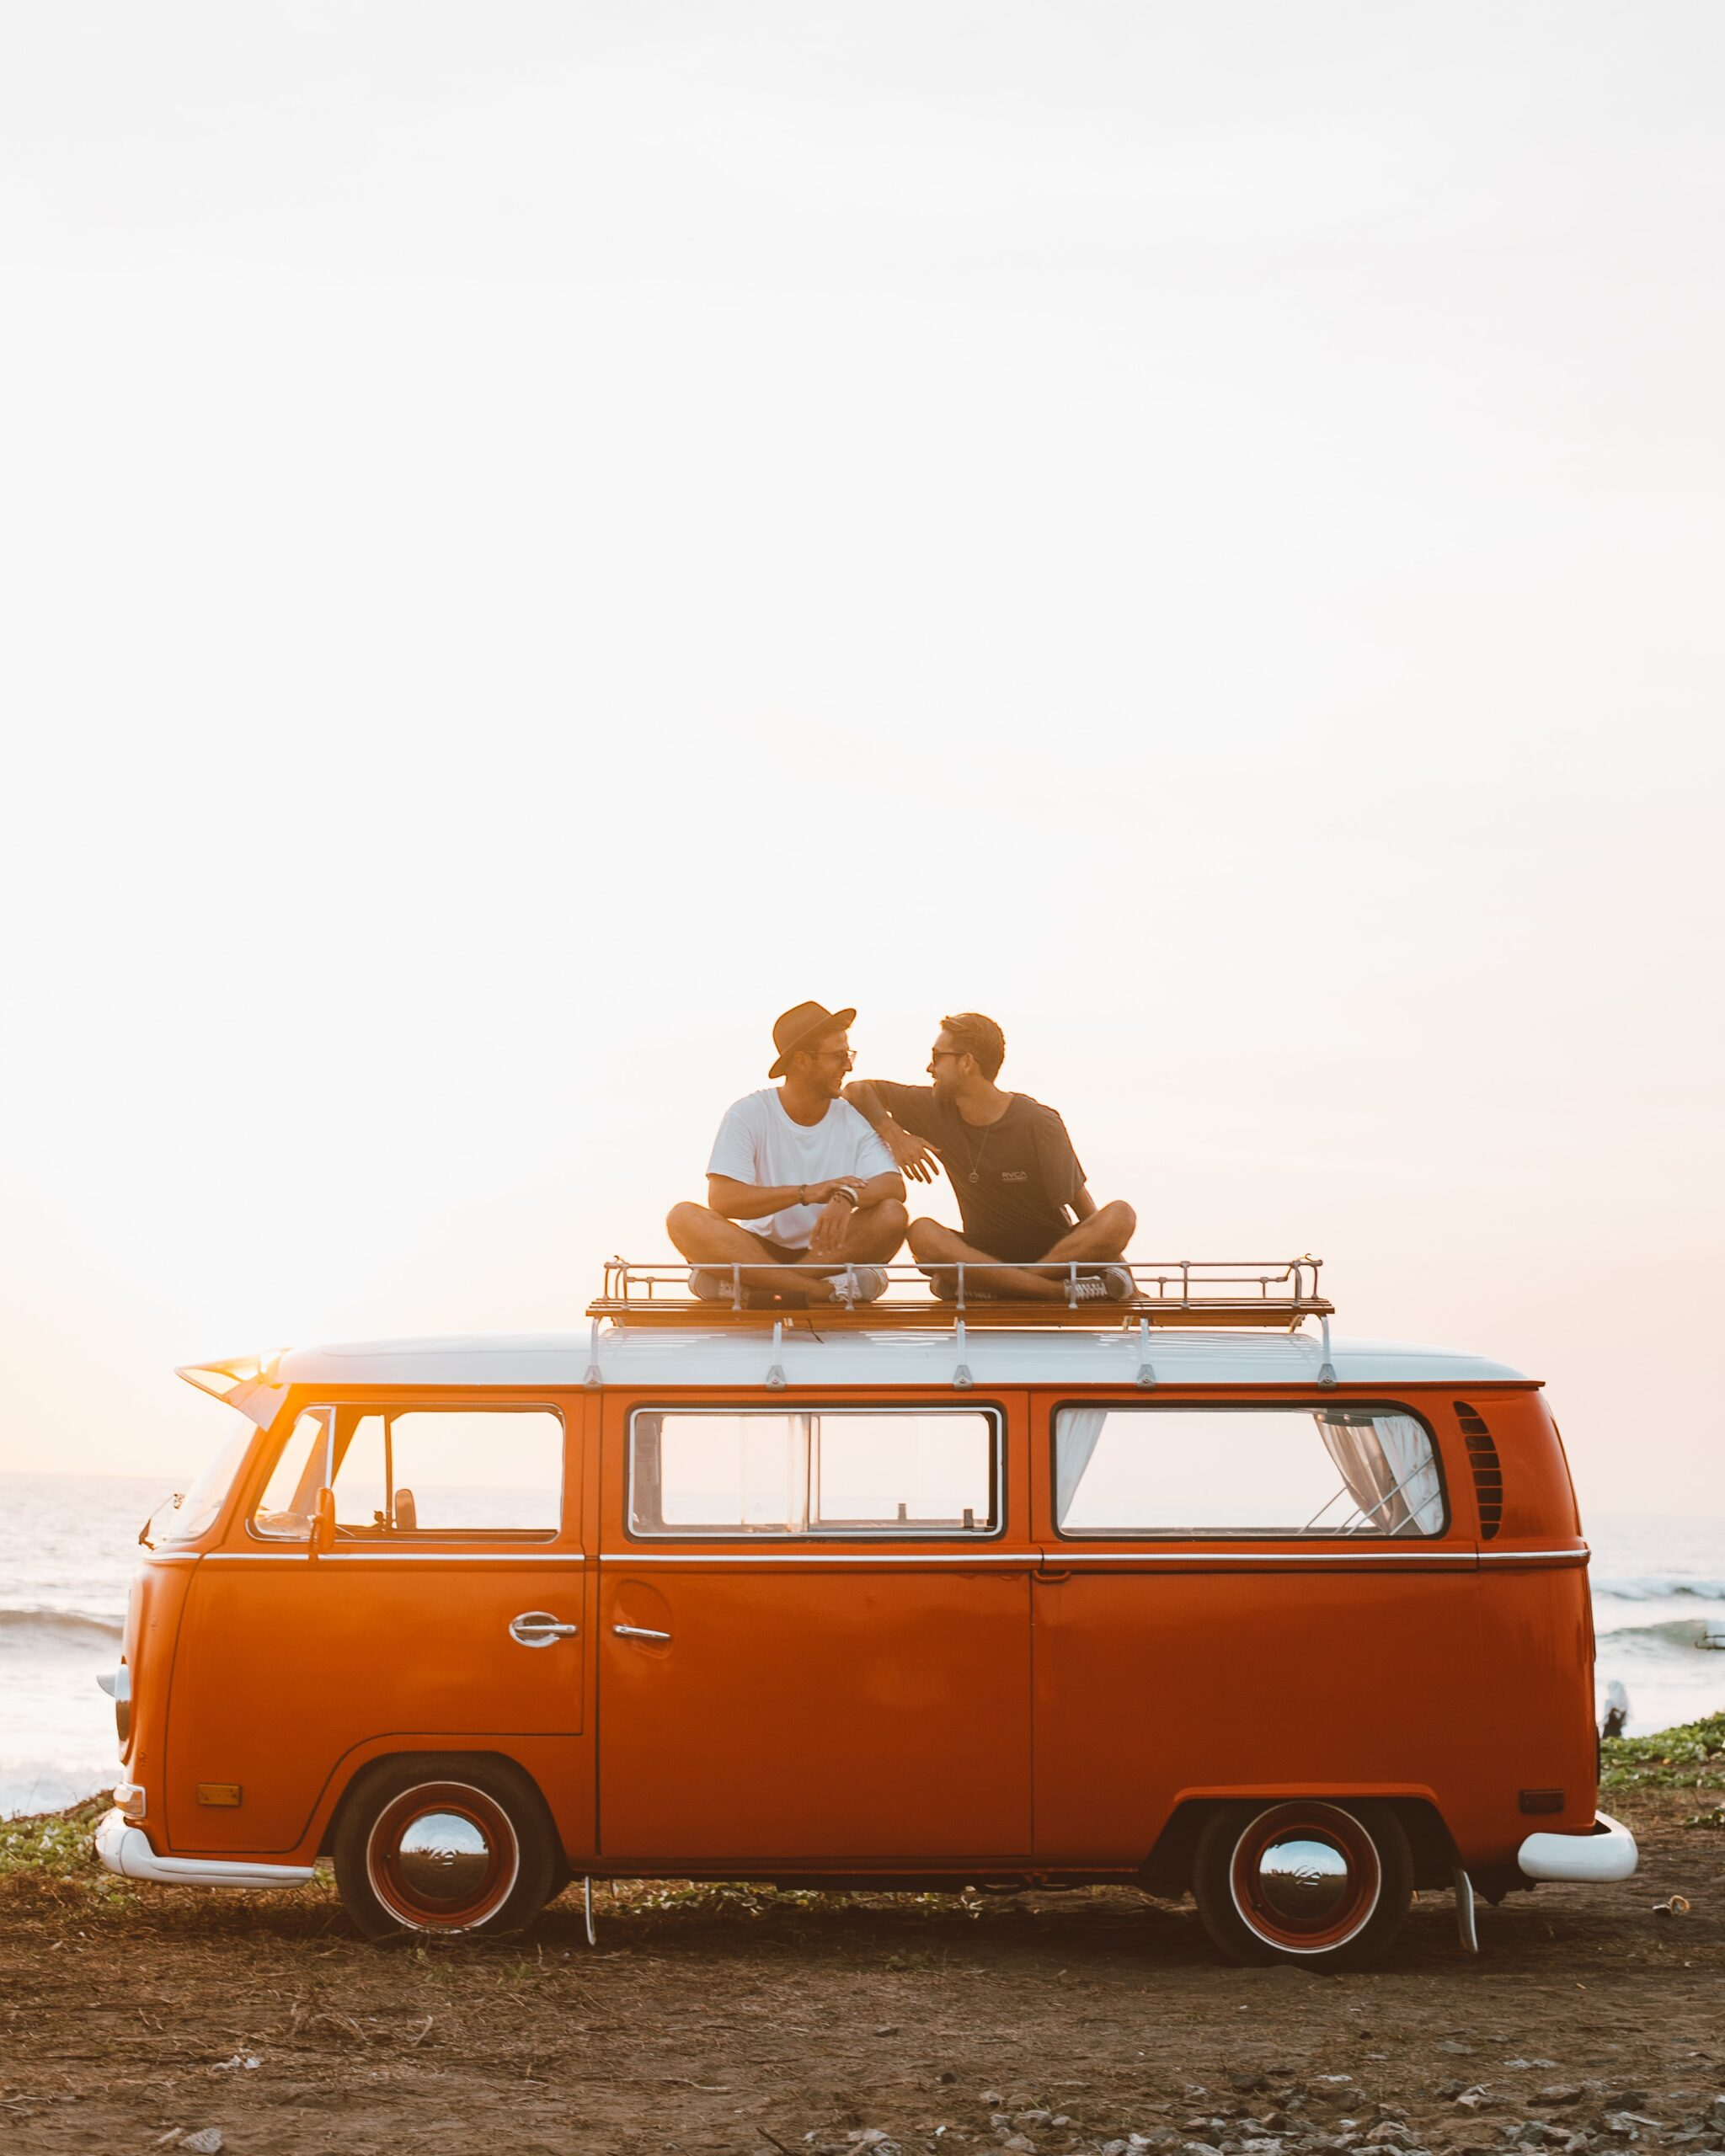 Two people on top of a van